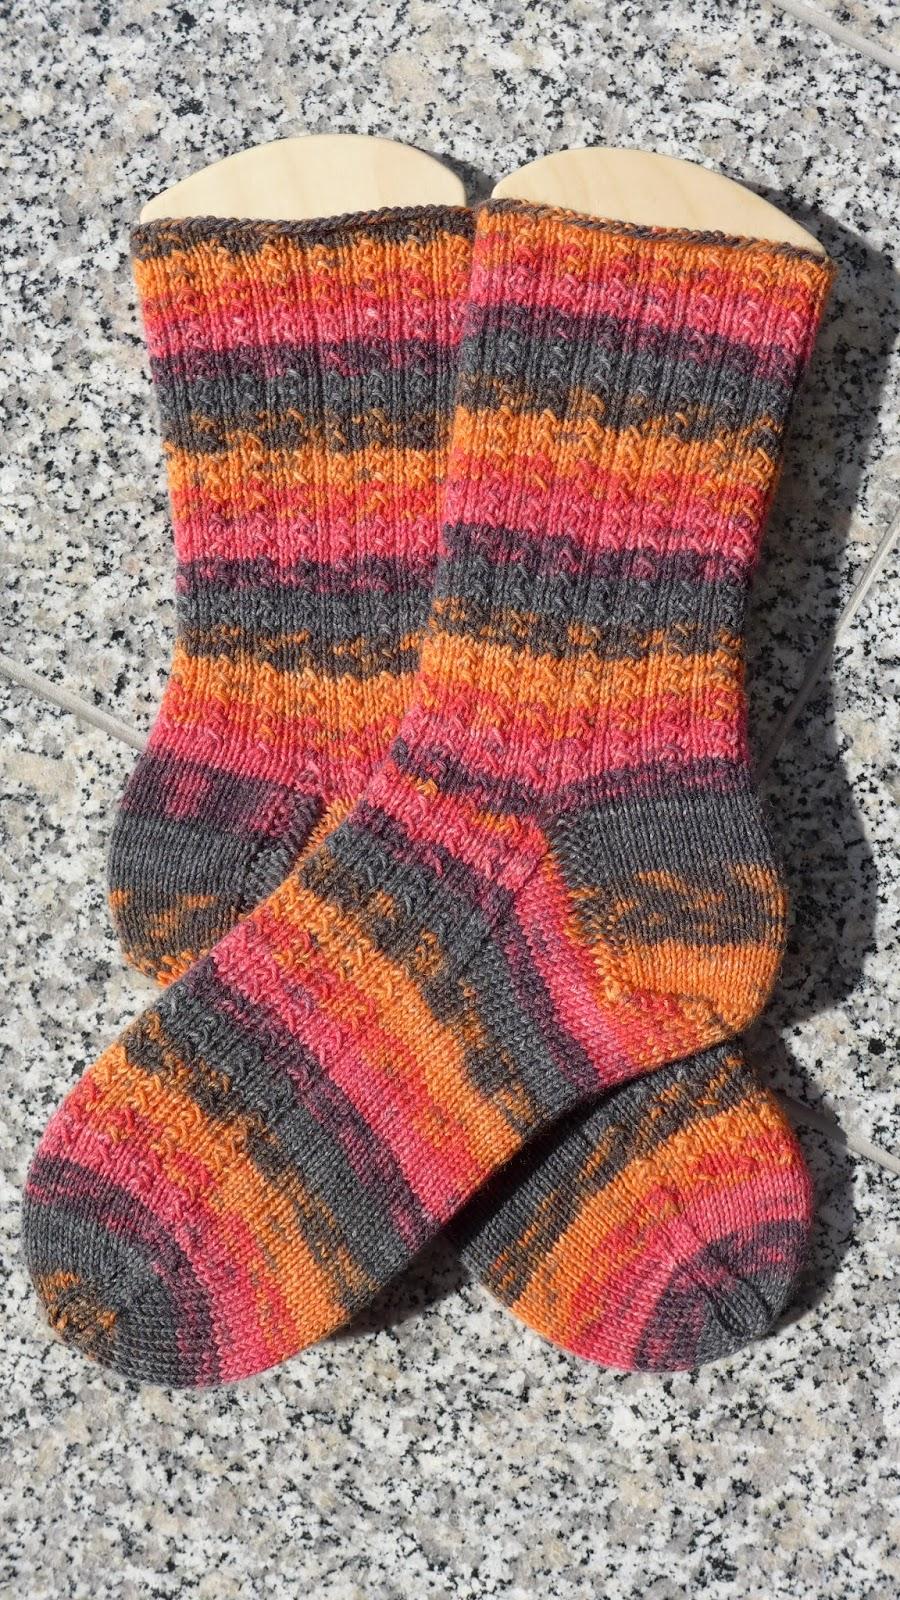 Raupensocken Knitting Socks Knitting Patterns Knitting